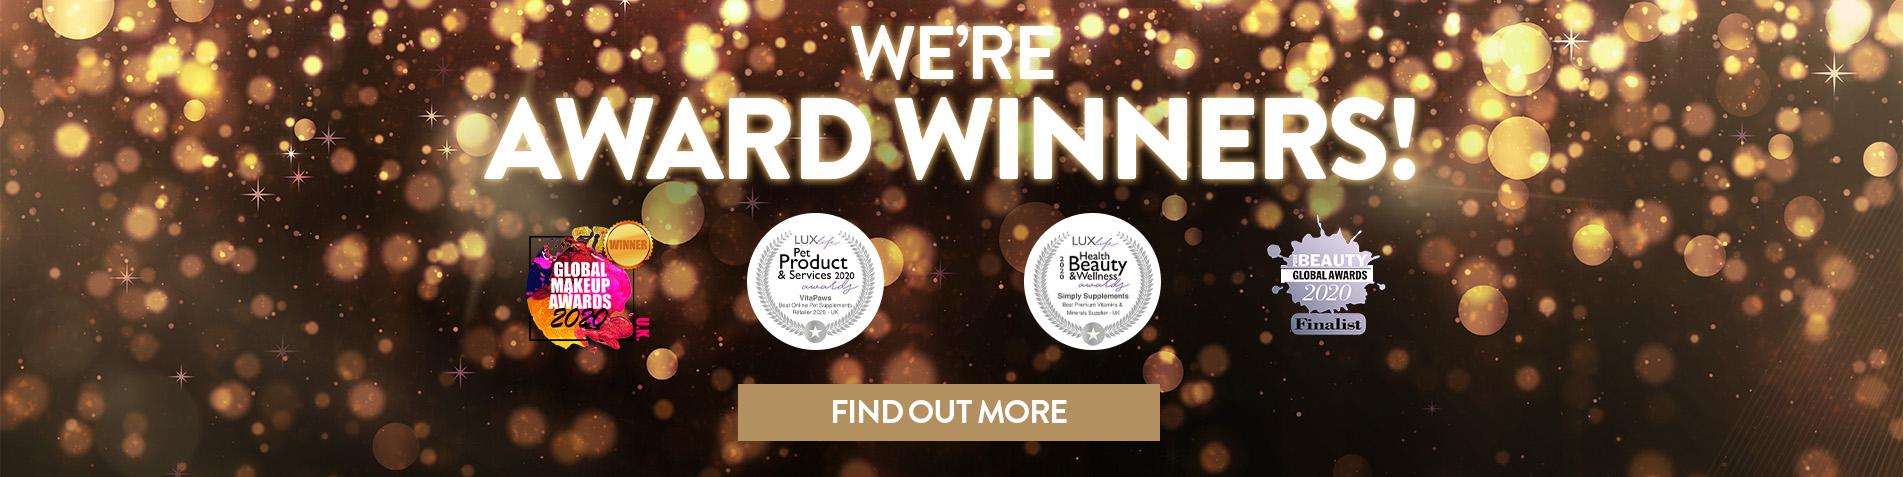 We're Award Winners!